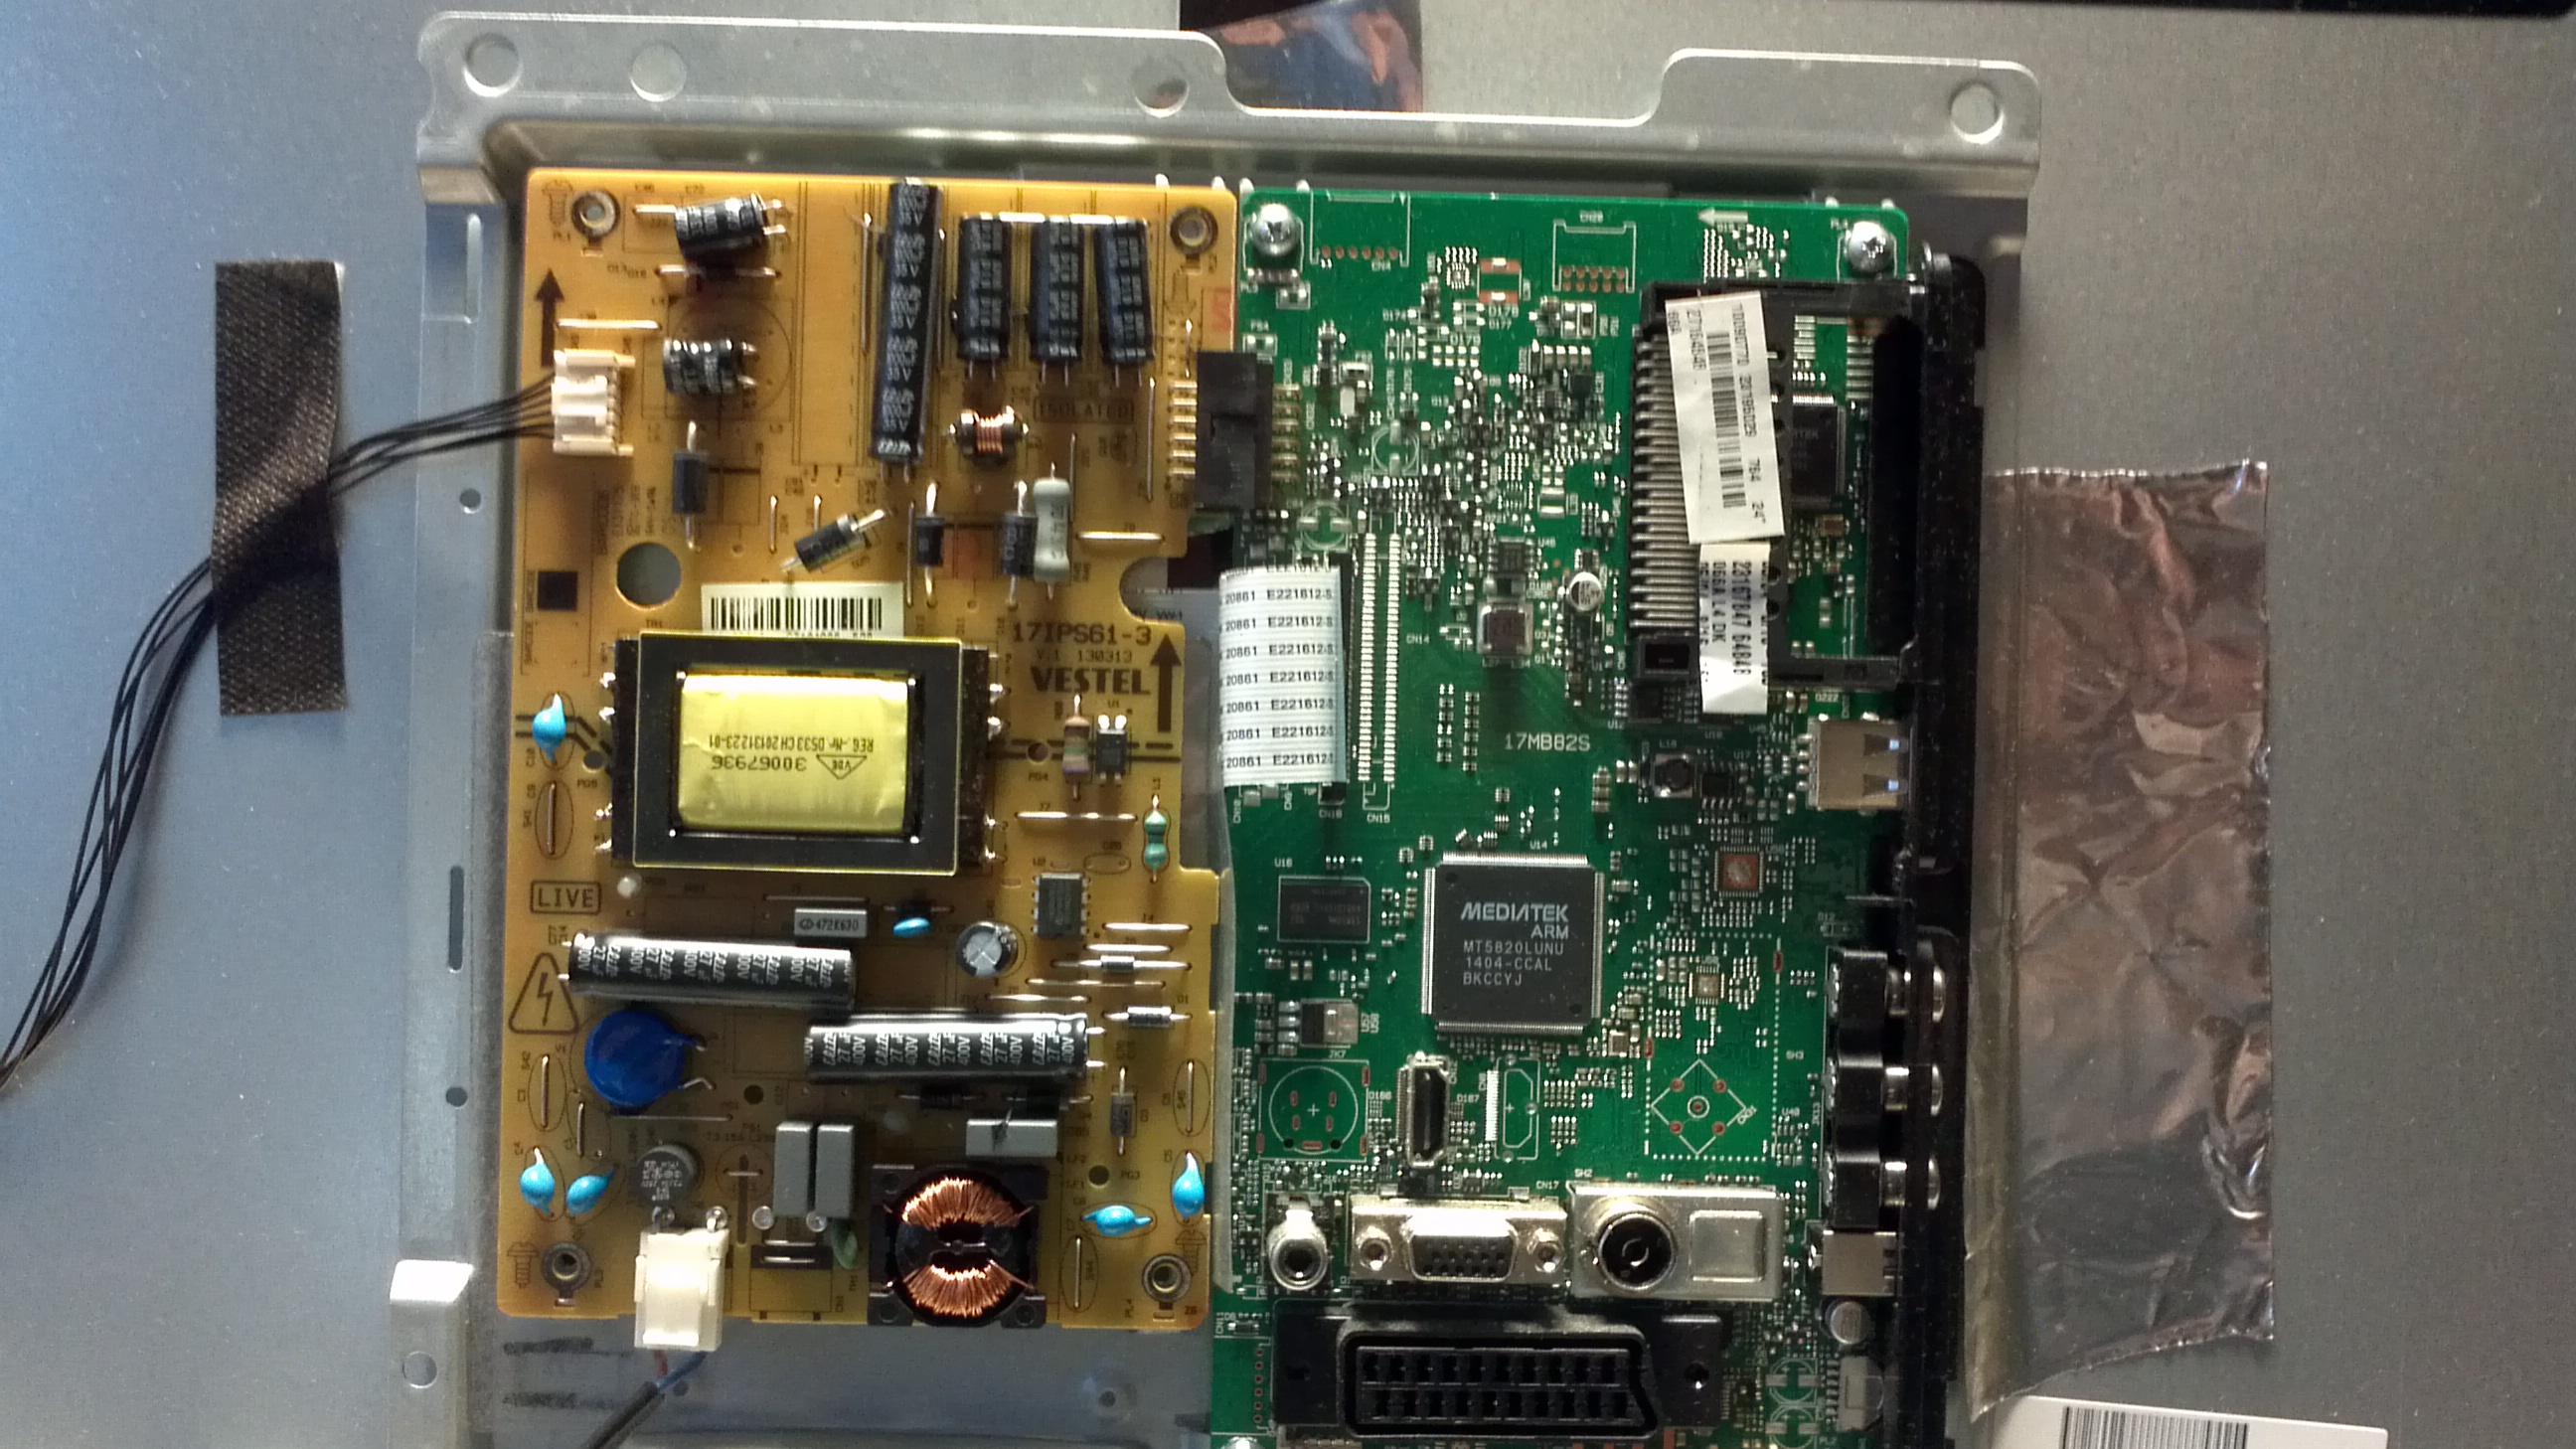 Neo LED-24680 FHD - 17MB82S - CiklonElectro